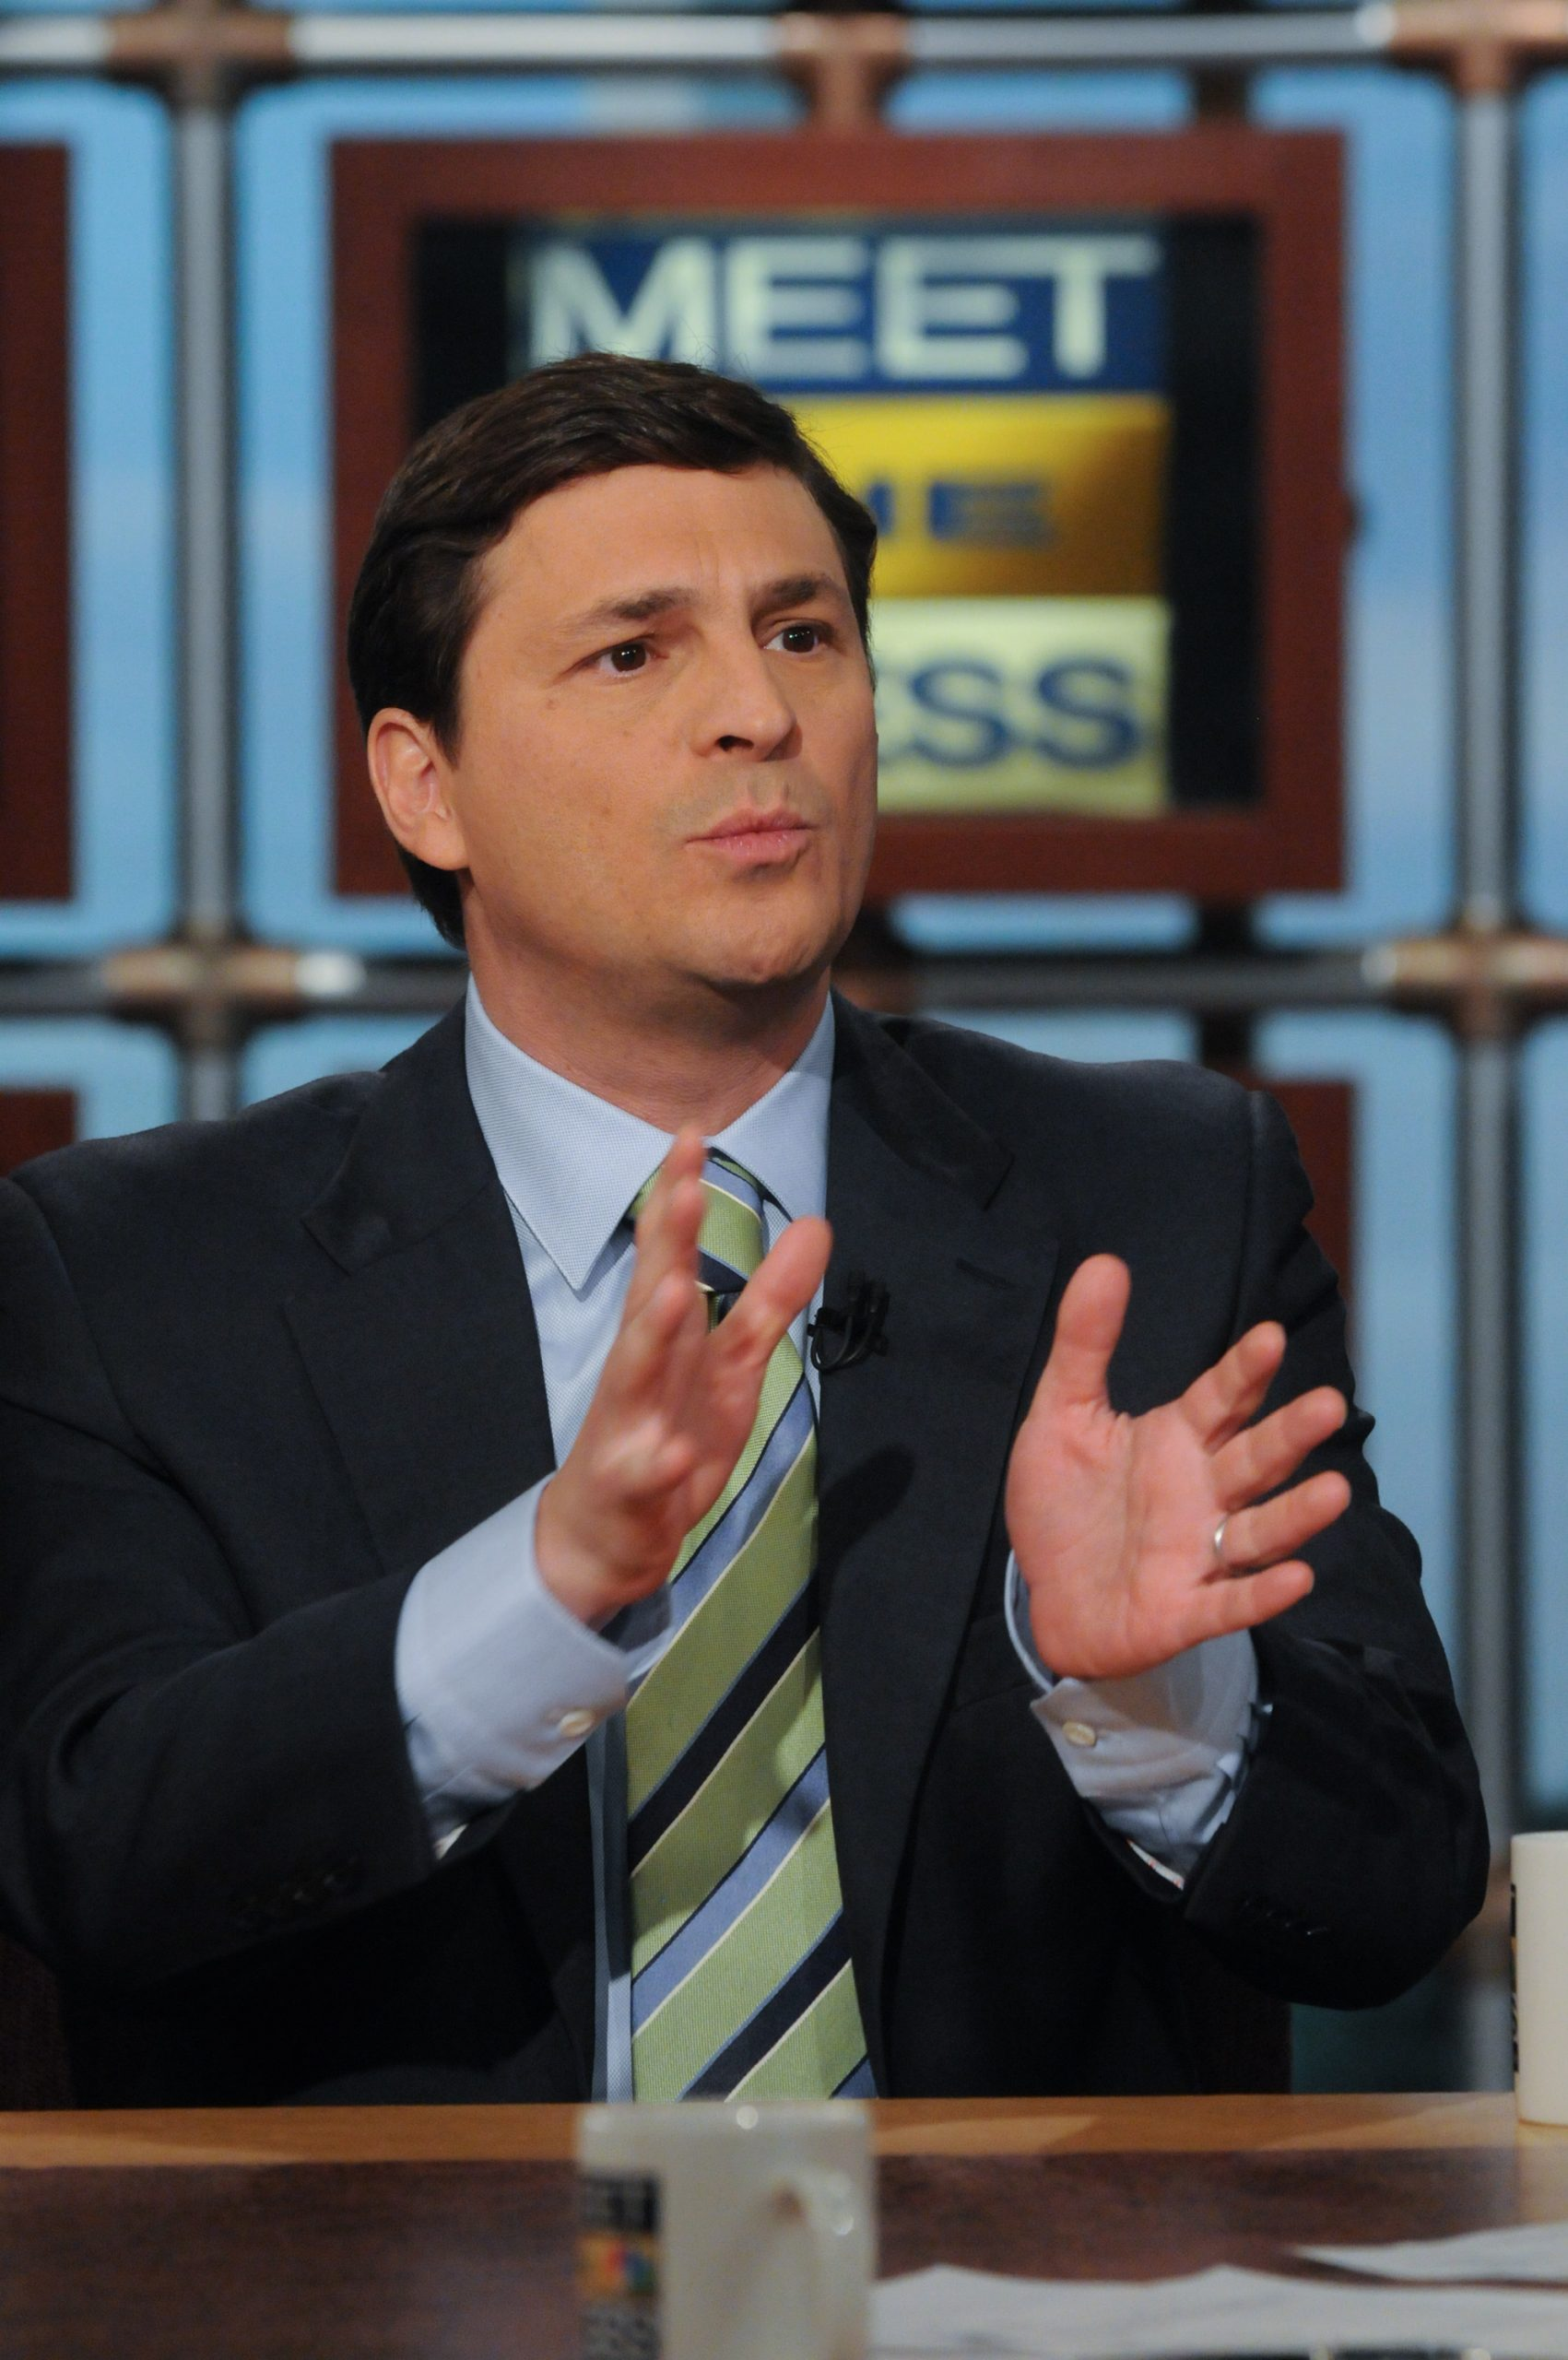 CNBC anchor David Faber